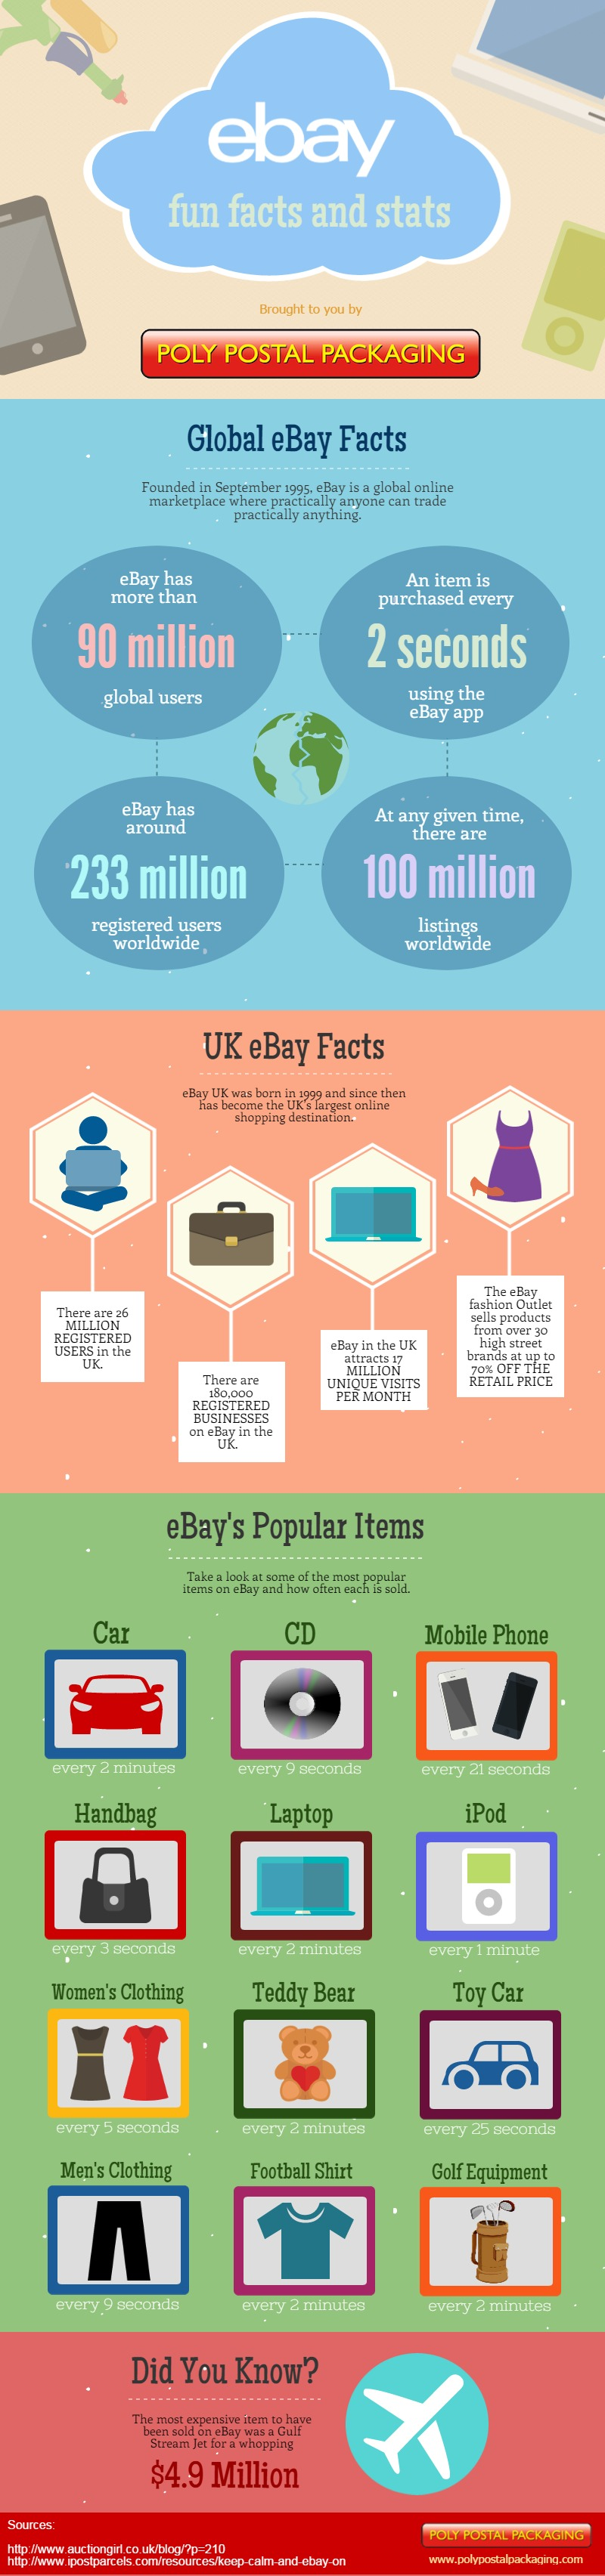 eBay_facts_and_statistics_UK_2014